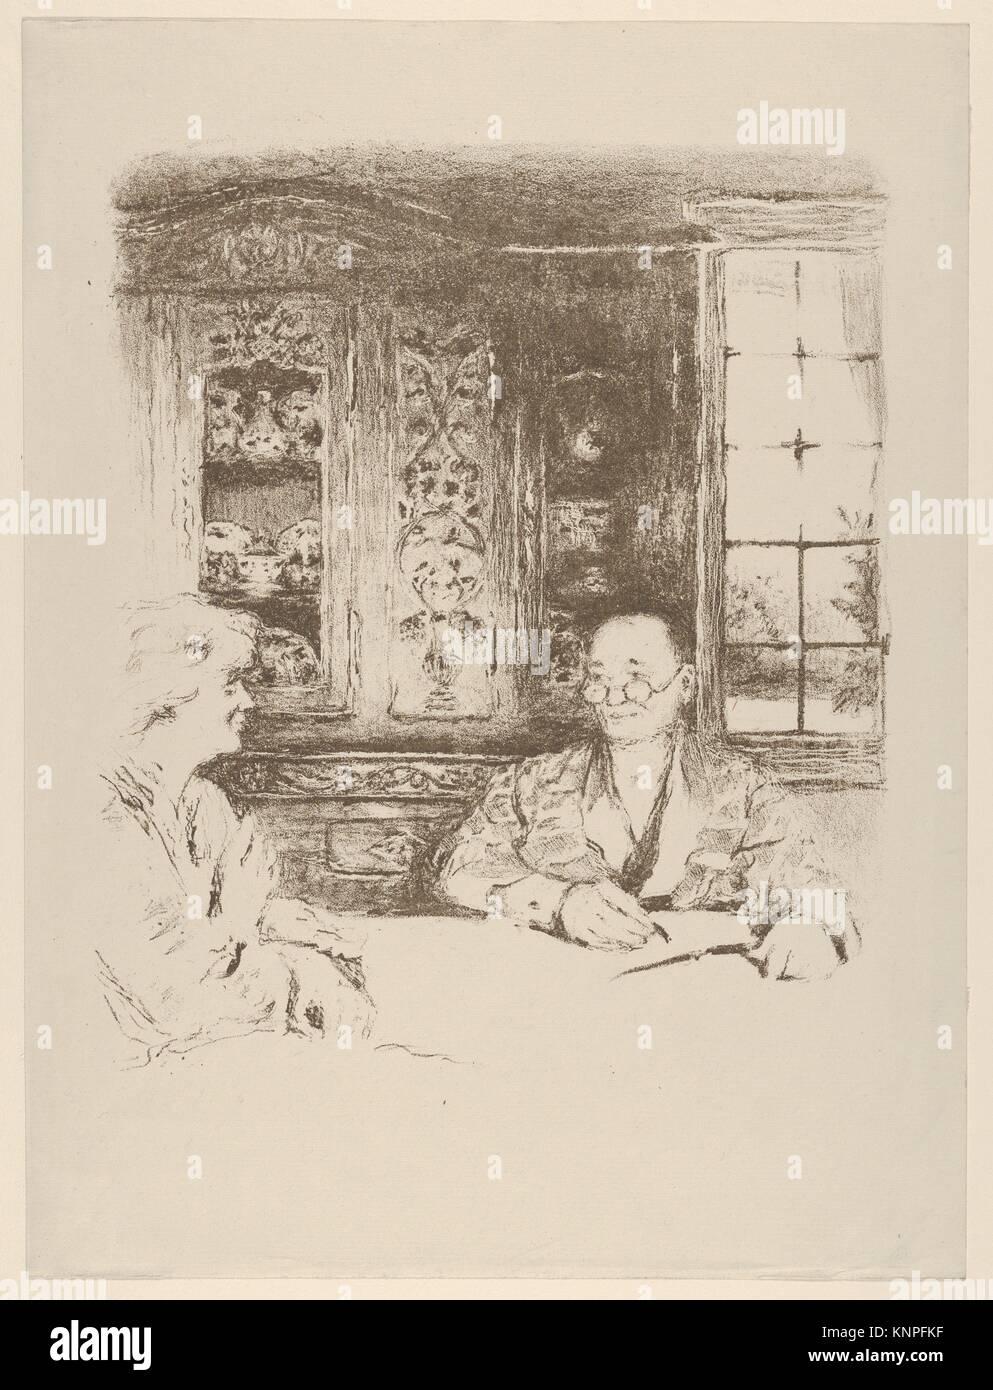 1 2 1951 Stockfotos & 1 2 1951 Bilder - Alamy